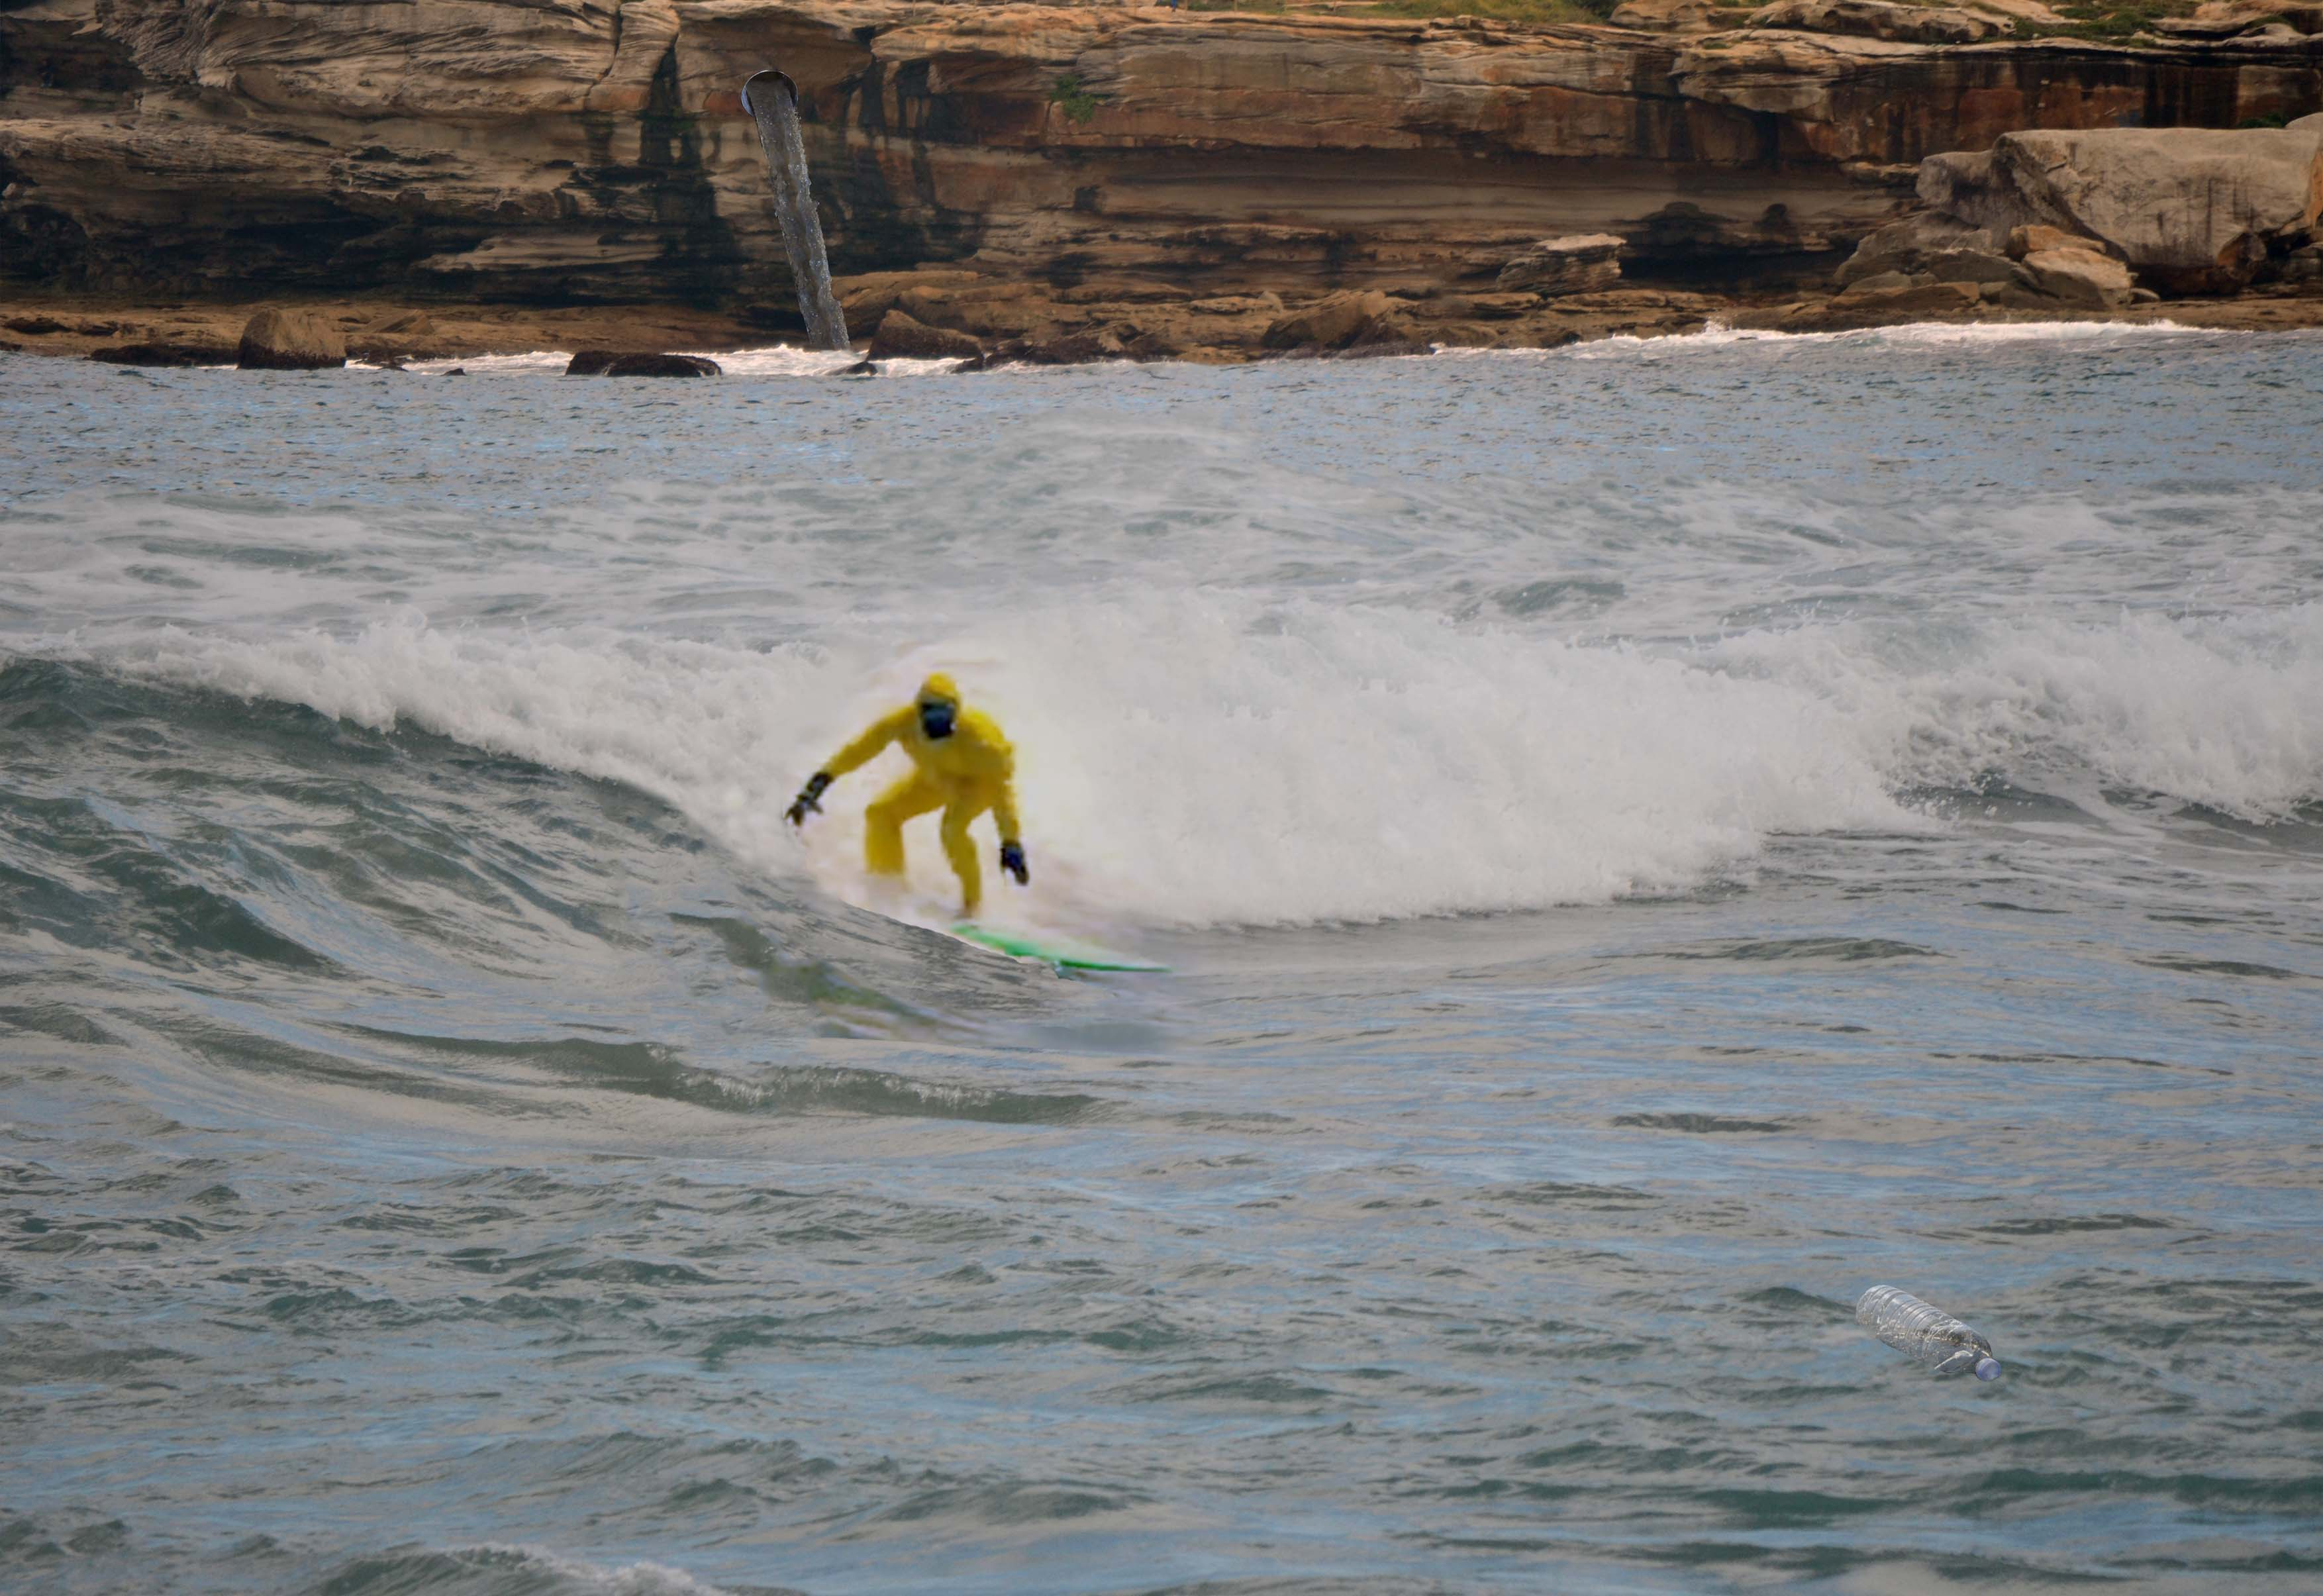 JakeNarunsky Surfing Appropriation _1